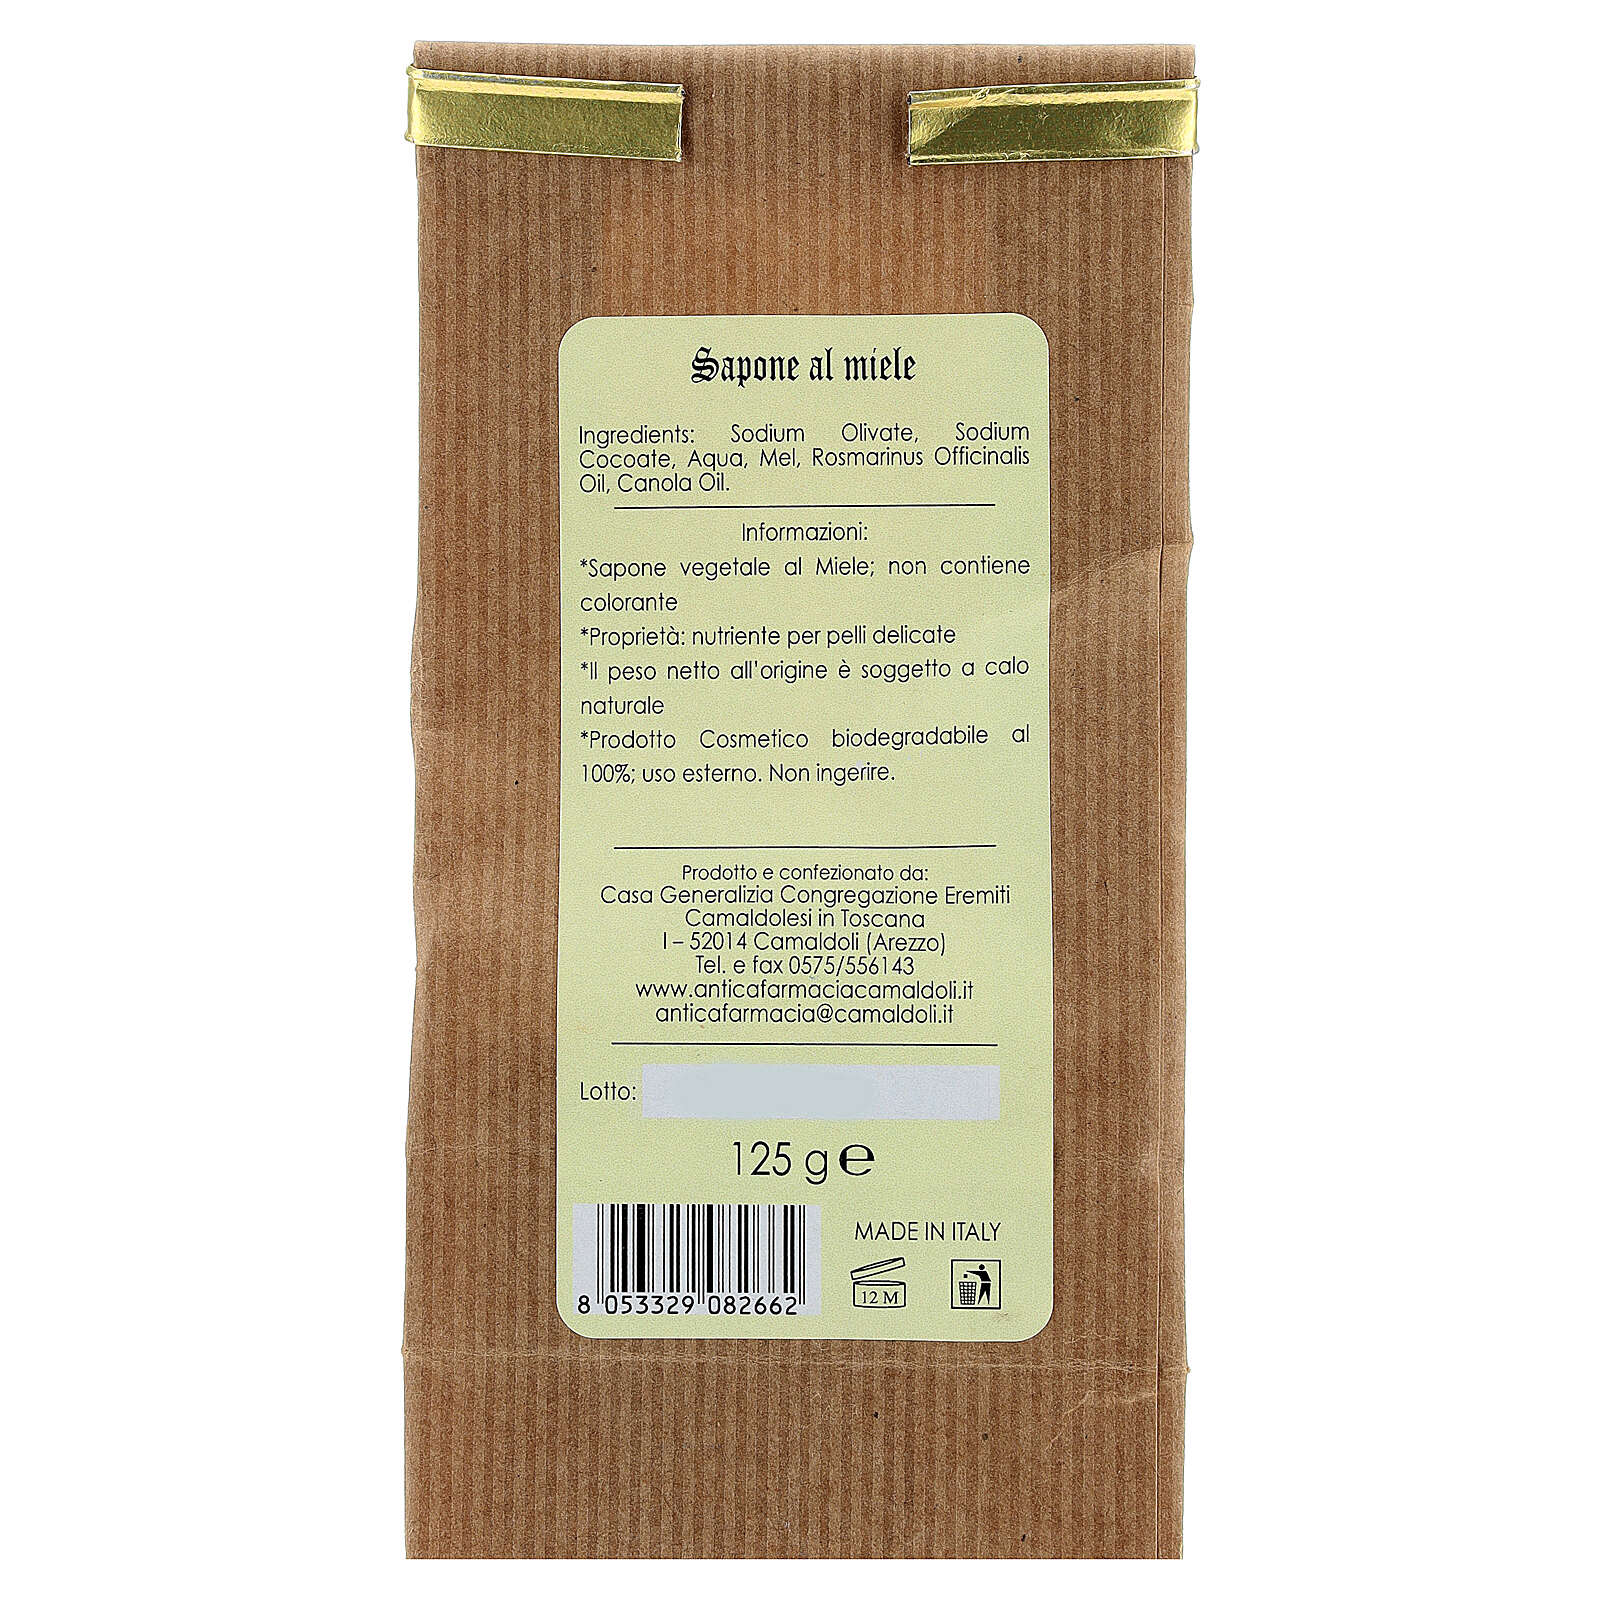 Sapone Naturale al Miele 125 gr Camaldoli 4